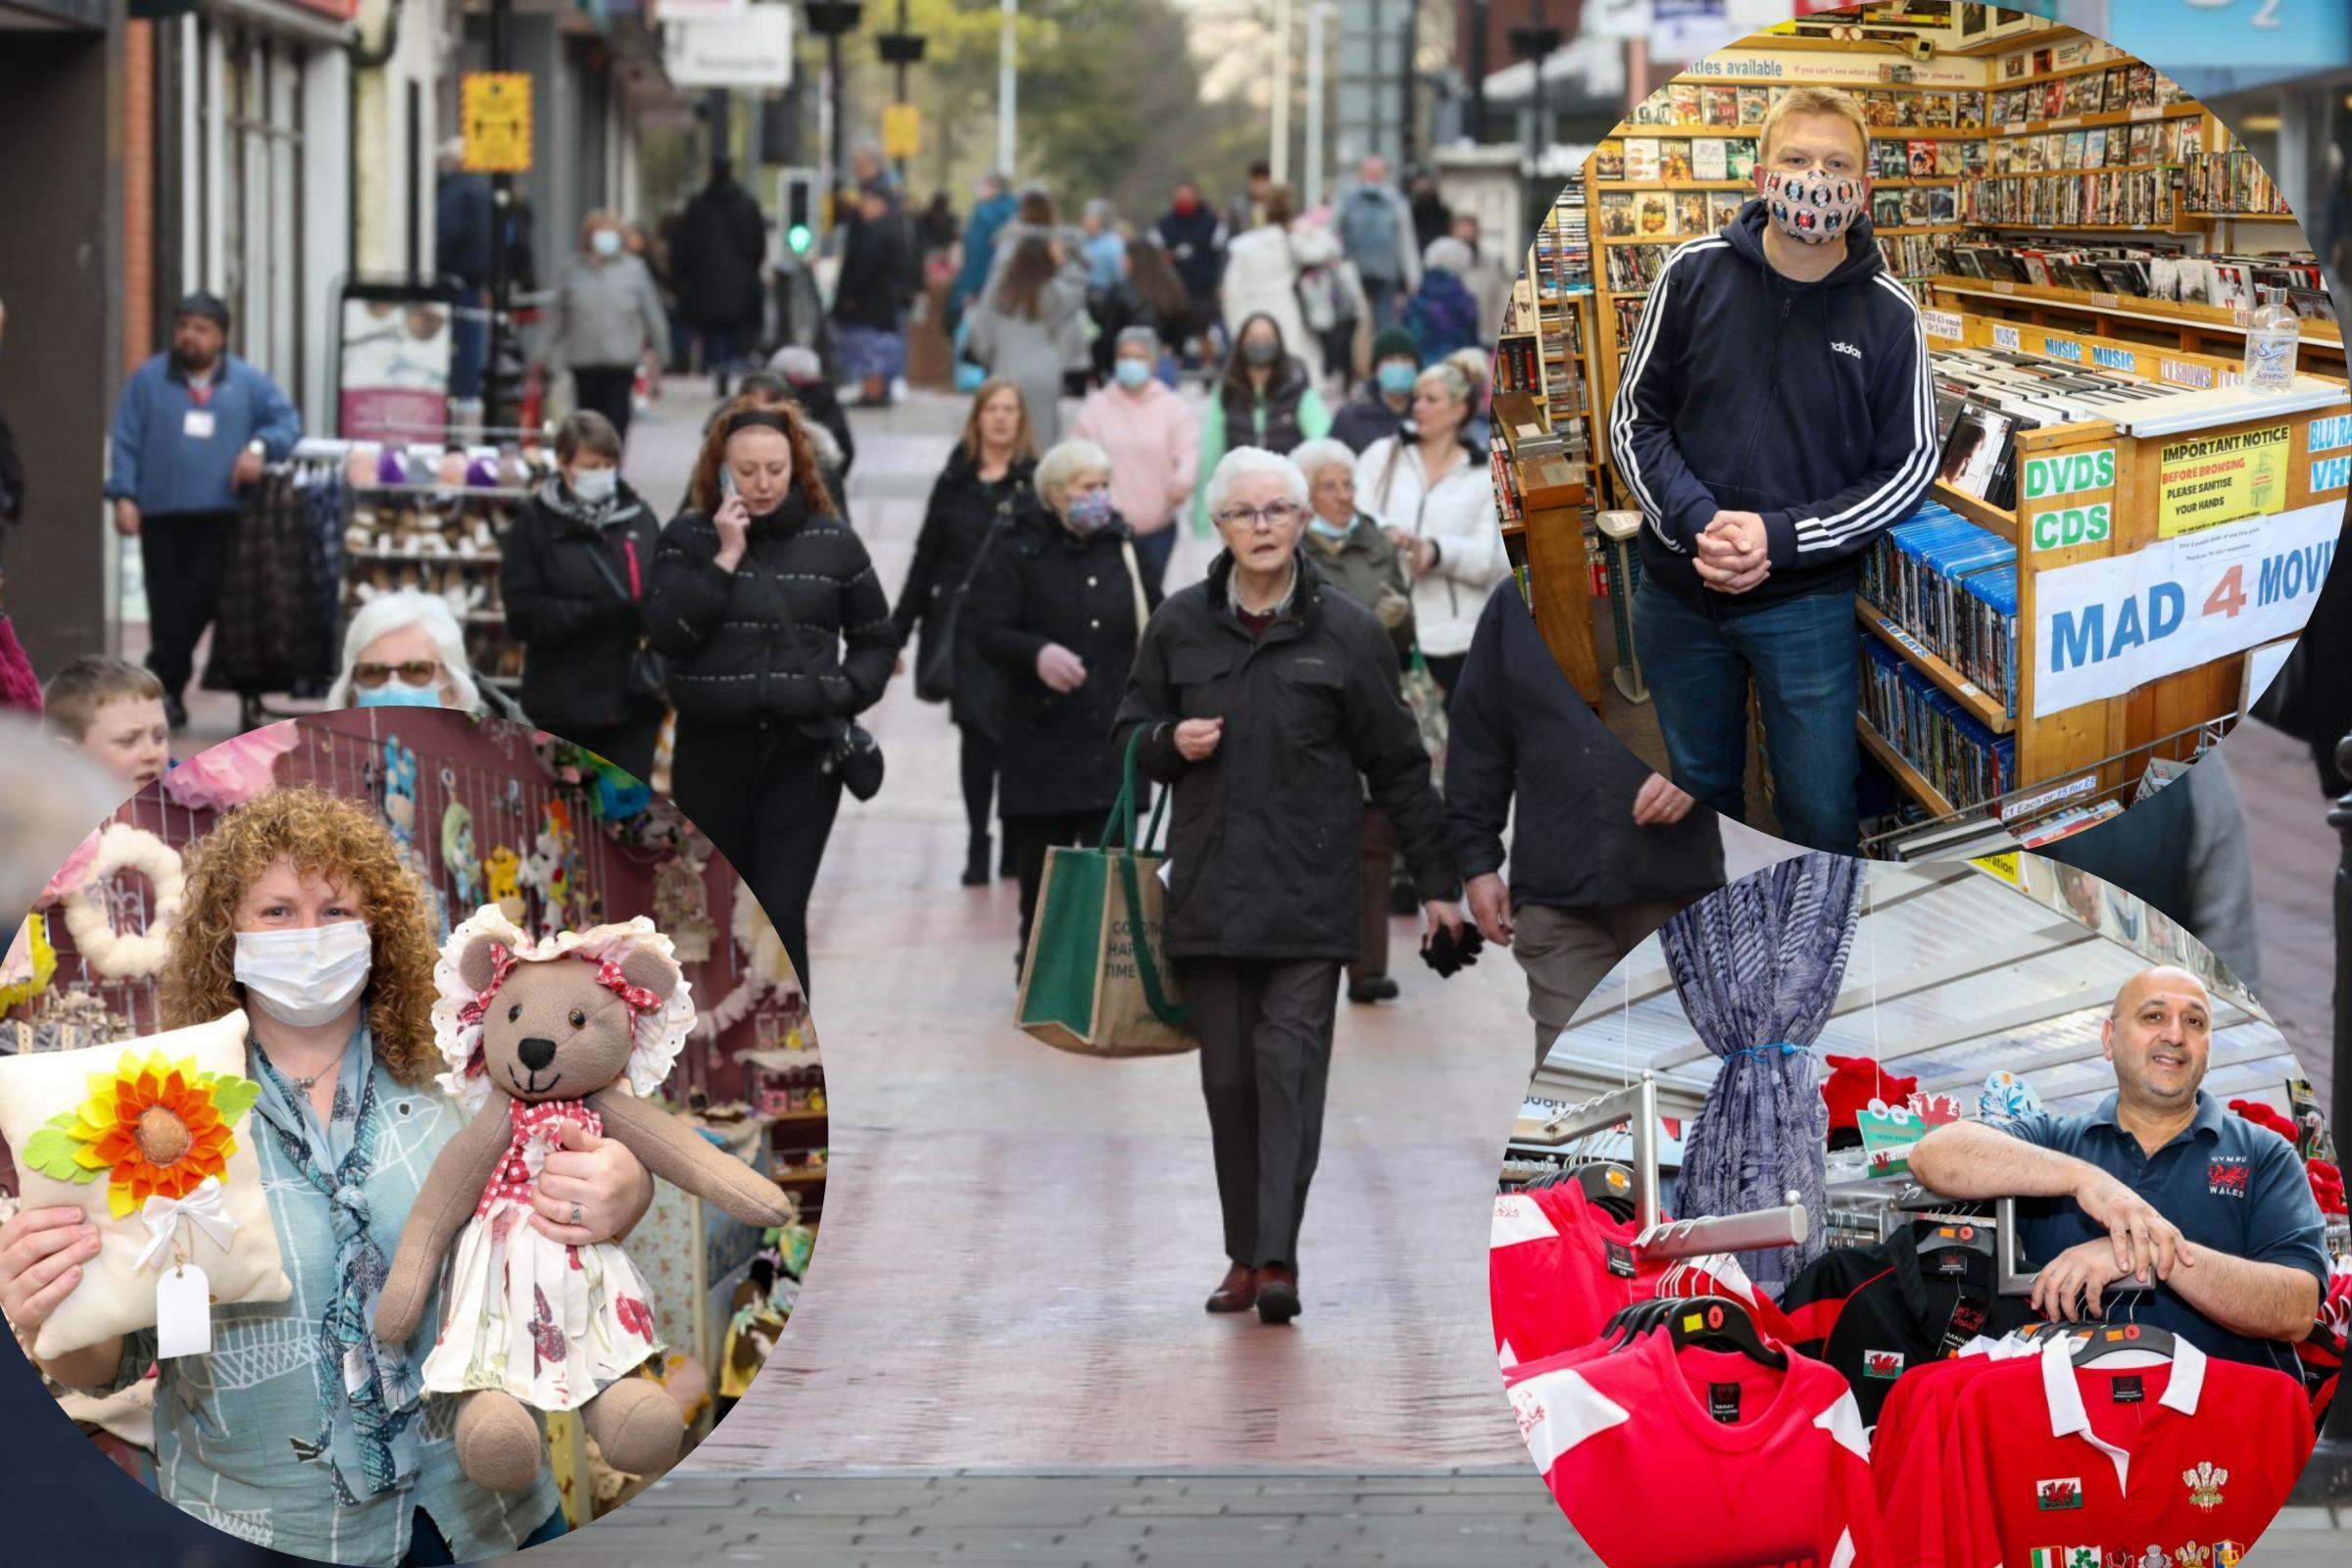 Back open for business! Shops in Wrexham reopen their doors